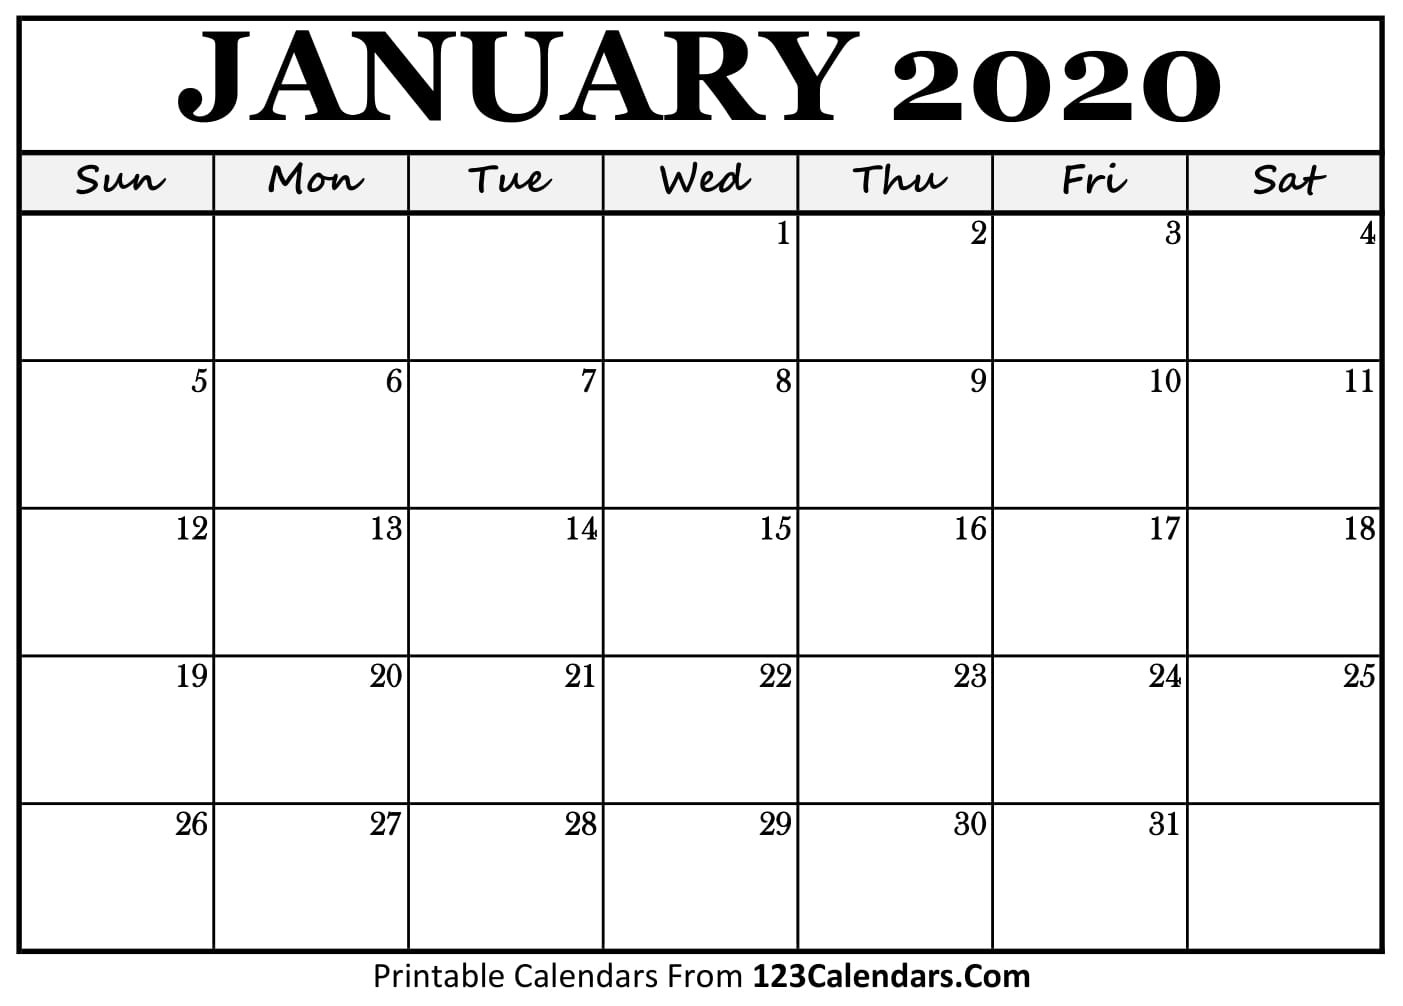 Free Printable Calendar | 123Calendars  Calendar Template 2020 Printable Free